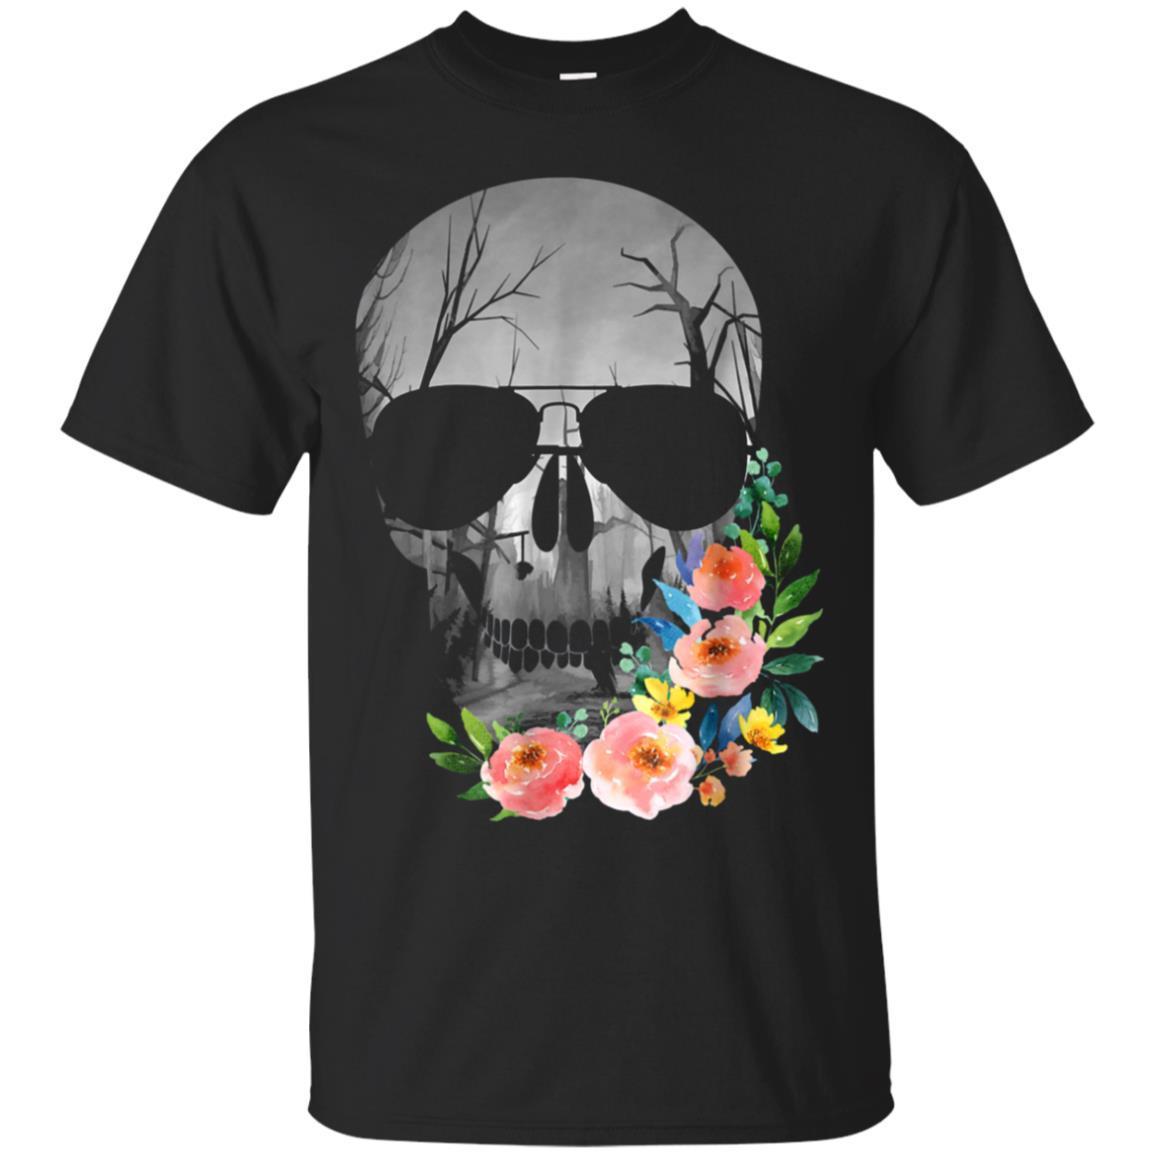 Halloween Flowered Skull T Shirt Bright Colors